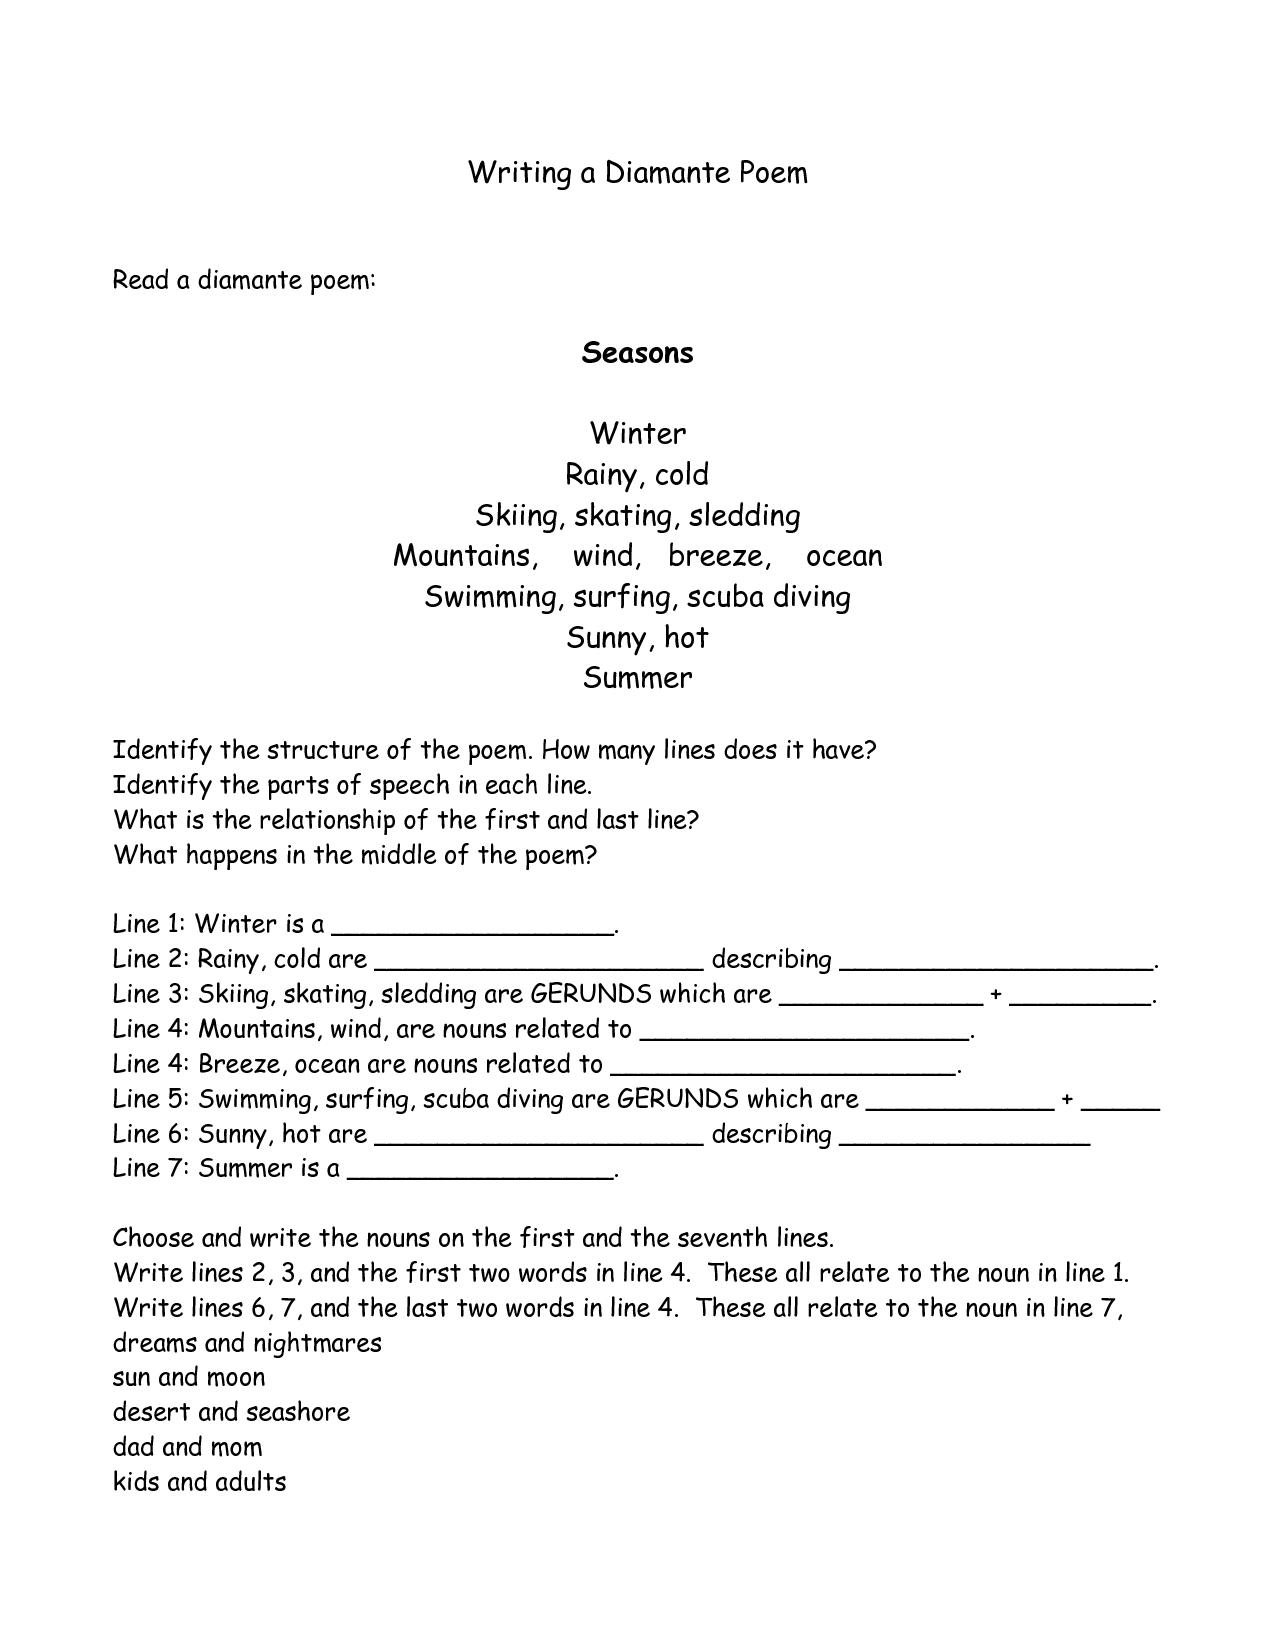 Writing A Diamante Poem Poetry Writing Teaching Writing Poetry